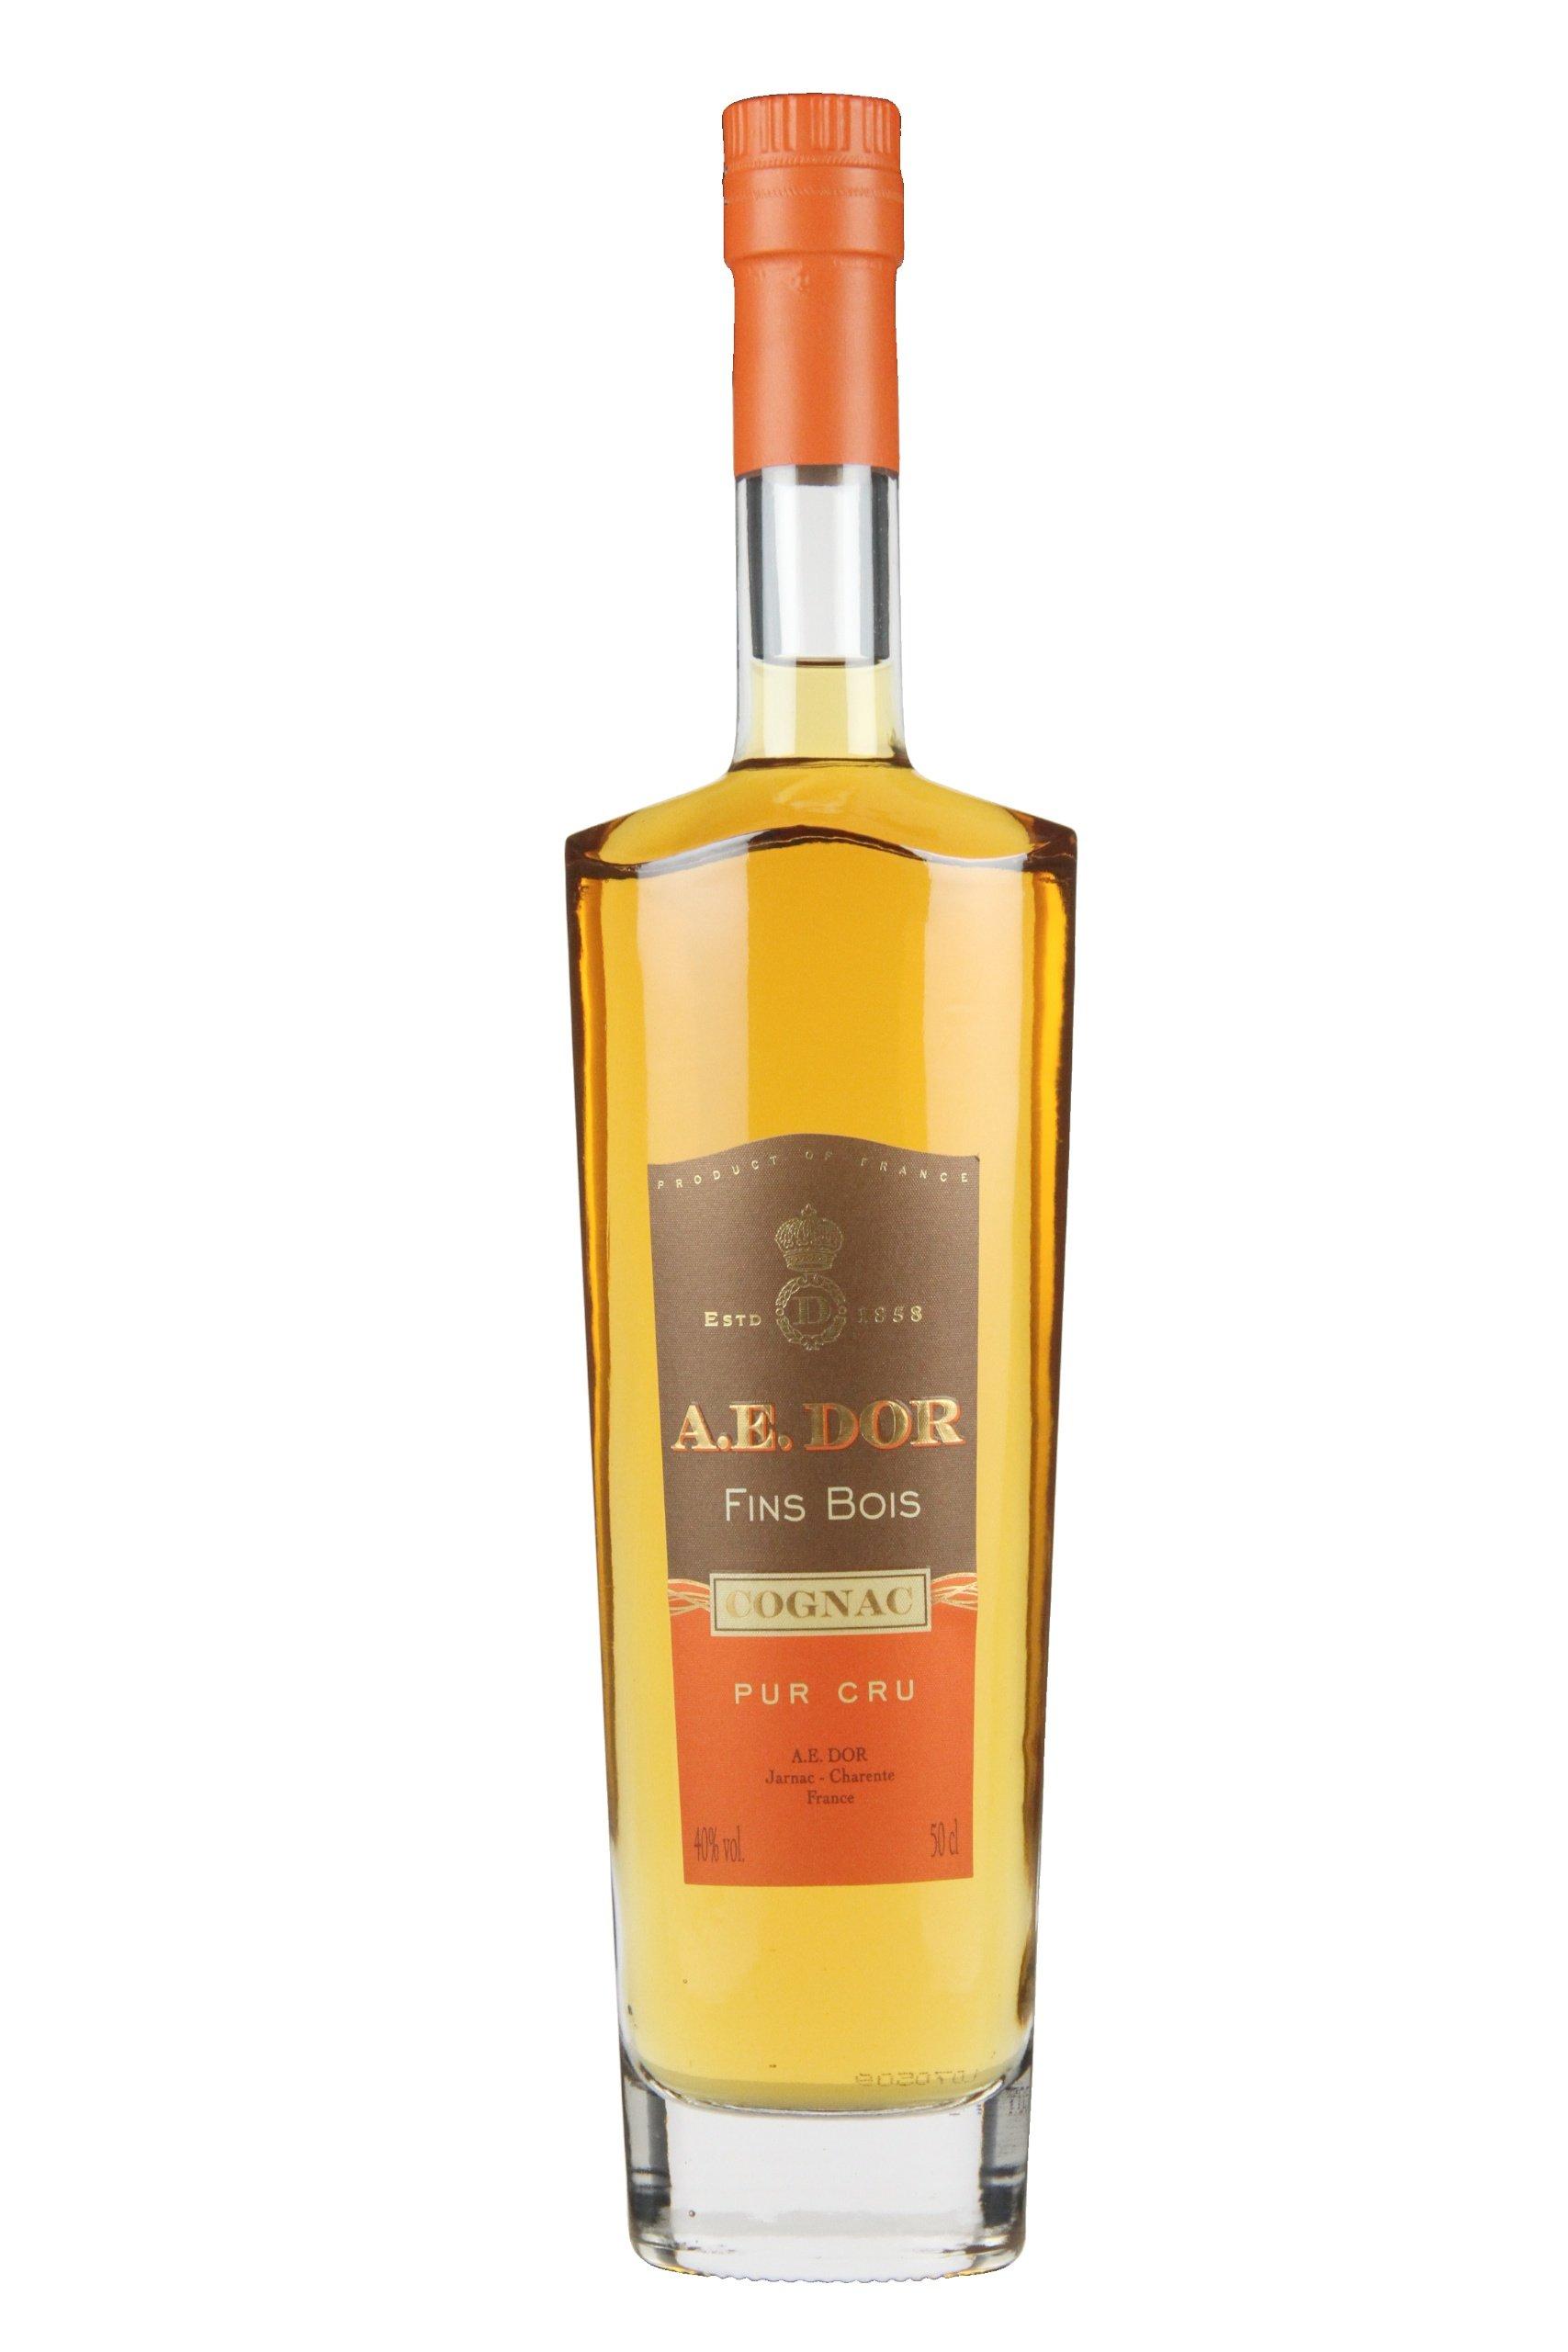 Cognac Fins Bois A.E. Dor